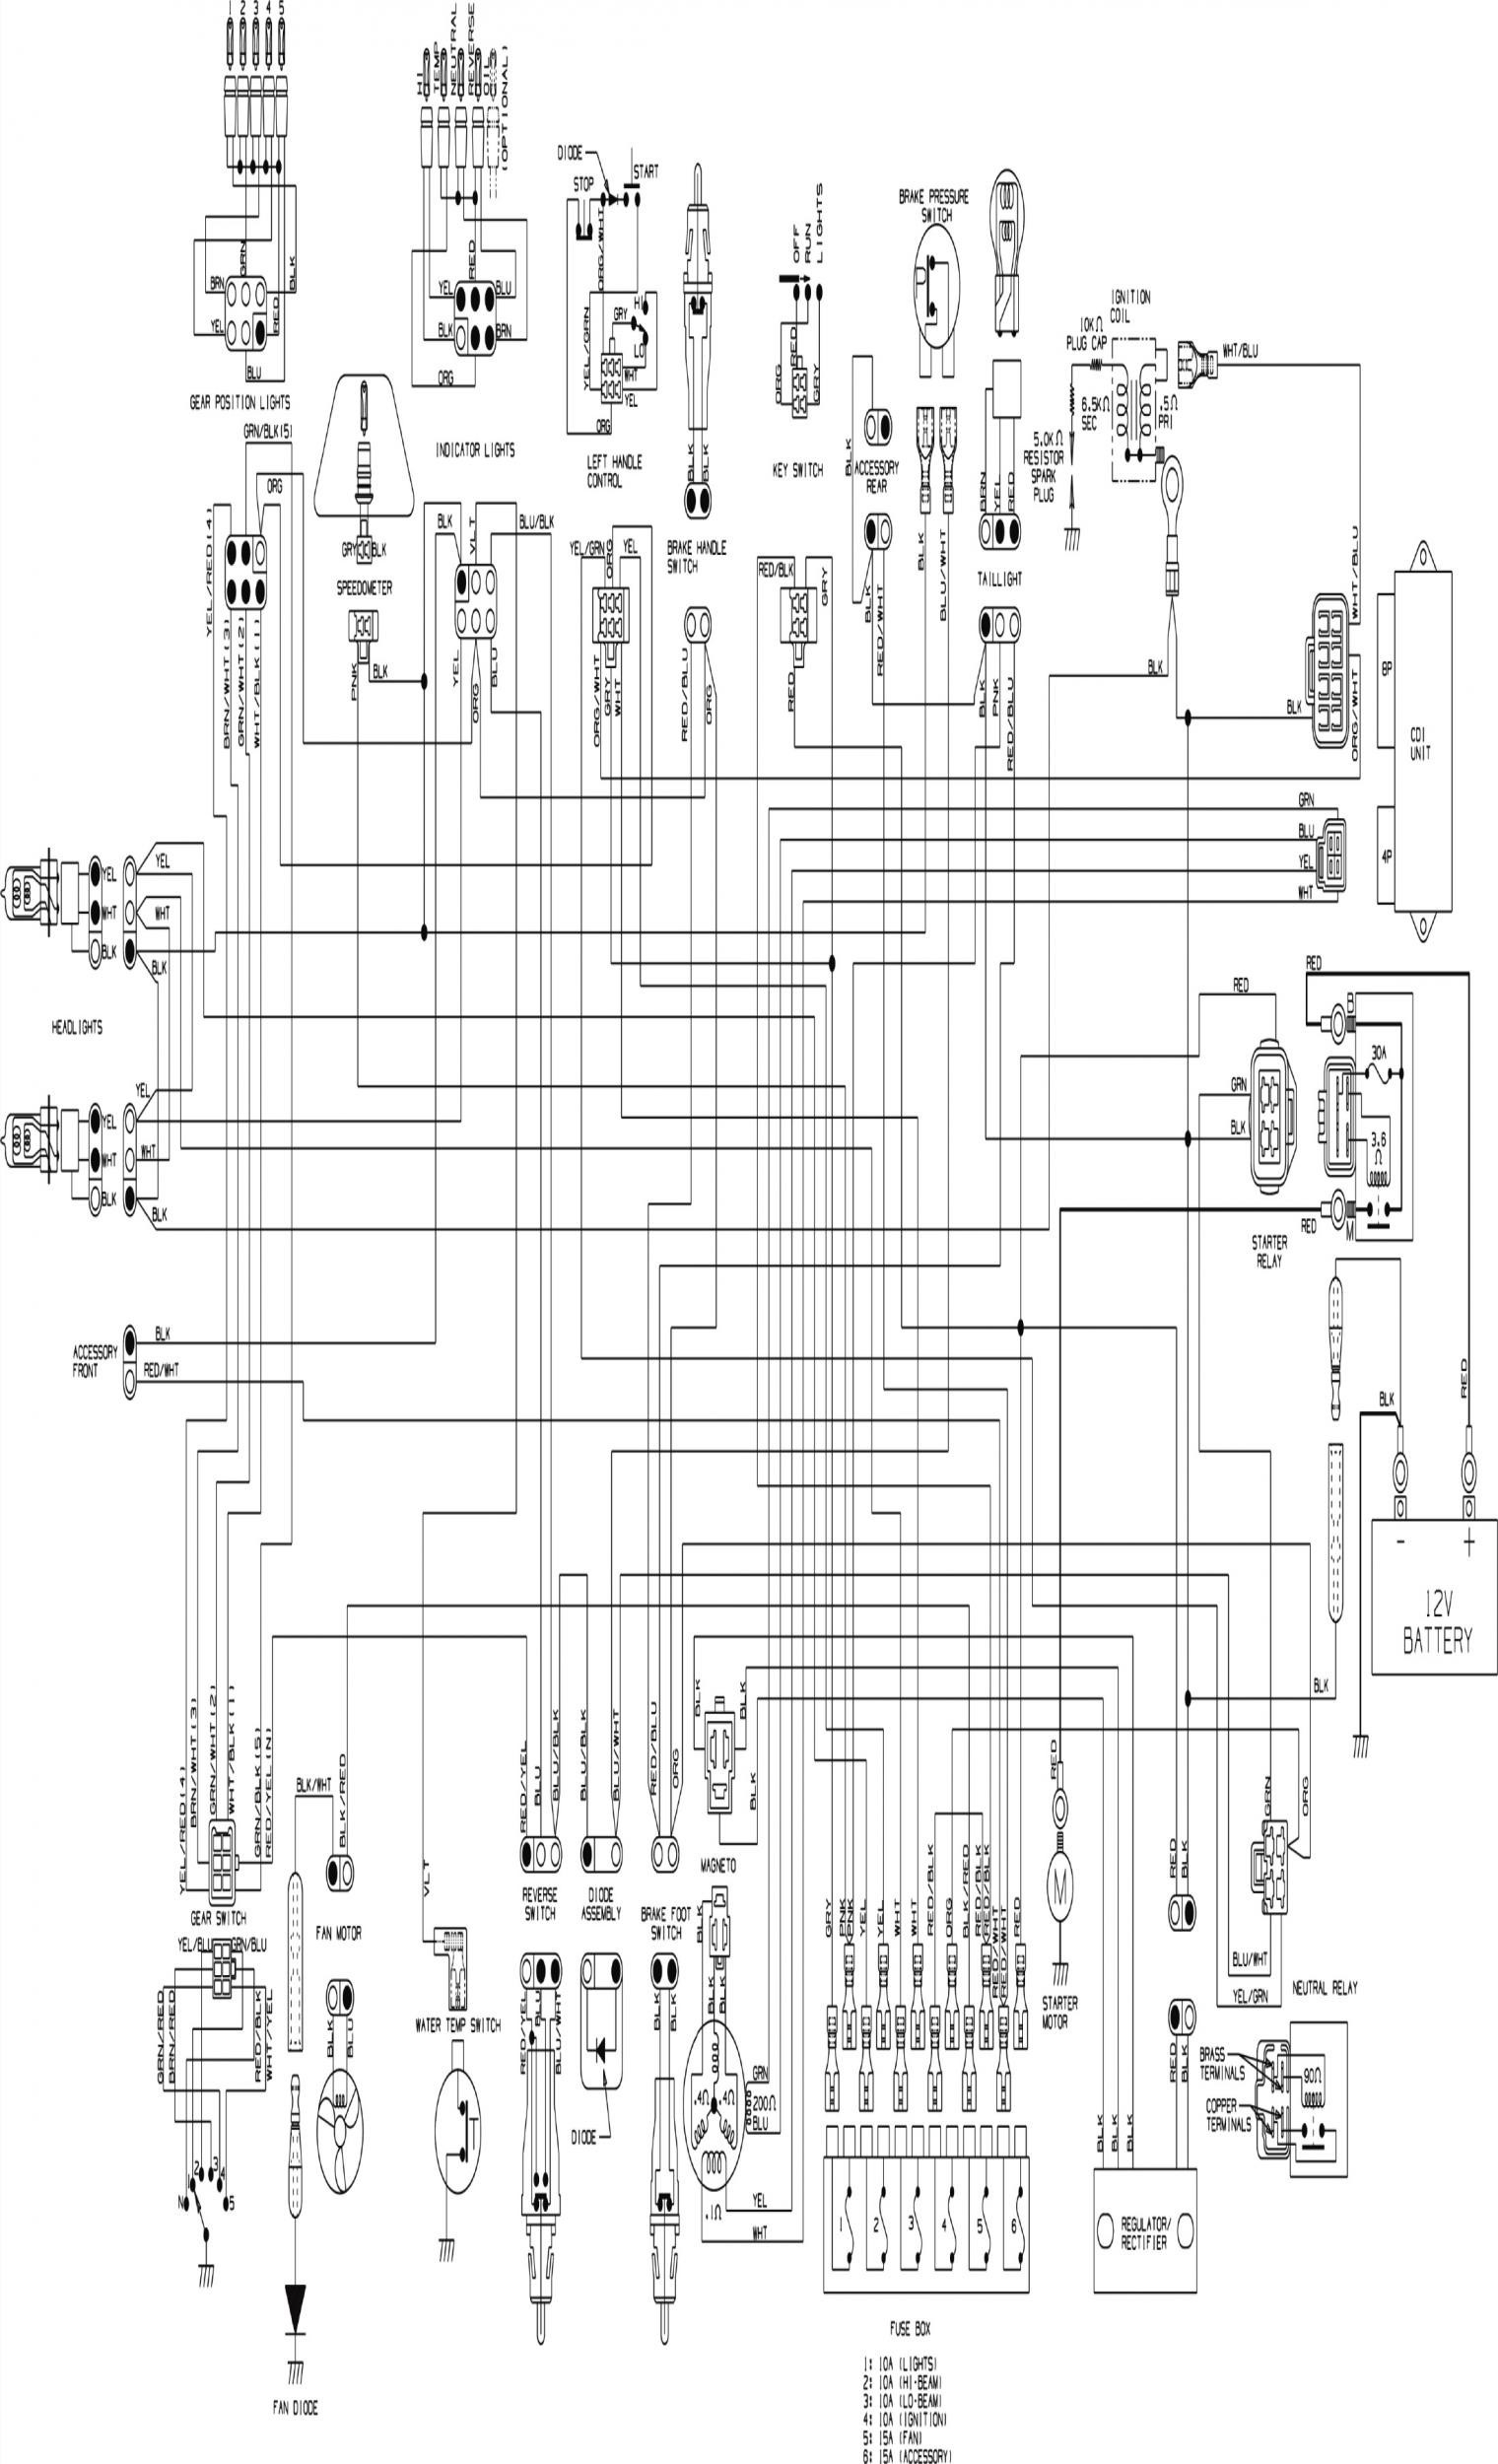 arctic cat snowmobile wiring diagram online wiring diagram Suzuki Wiring Diagrams arctic cat snowmobile wiring diagrams basic electronics wiring diagram arctic cat snowmobile wiring diagrams arctic cat snowmobile wiring diagram